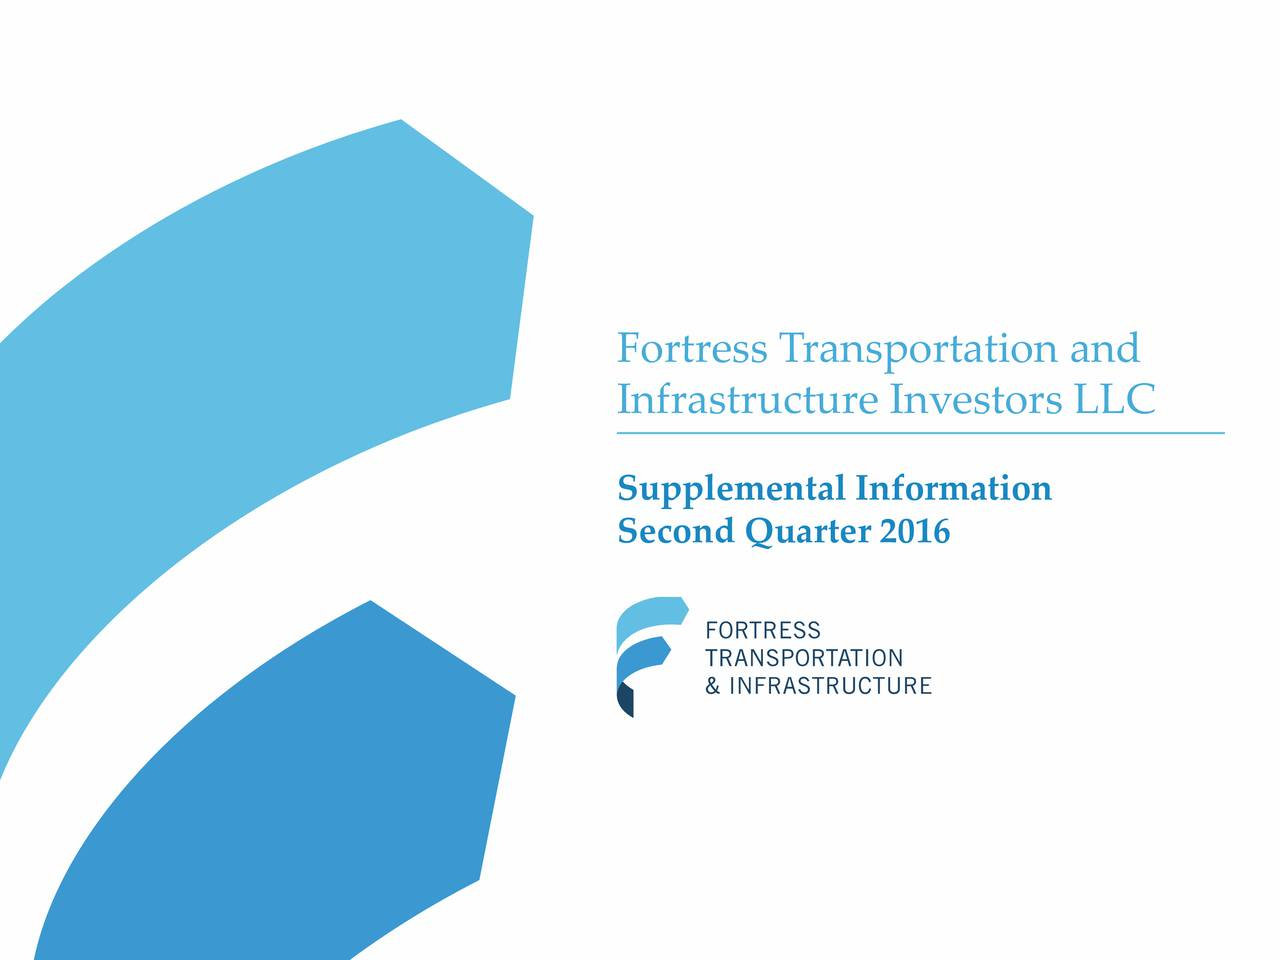 Infrastructure Investors LLC Supplemental Information Second Quarter 2016